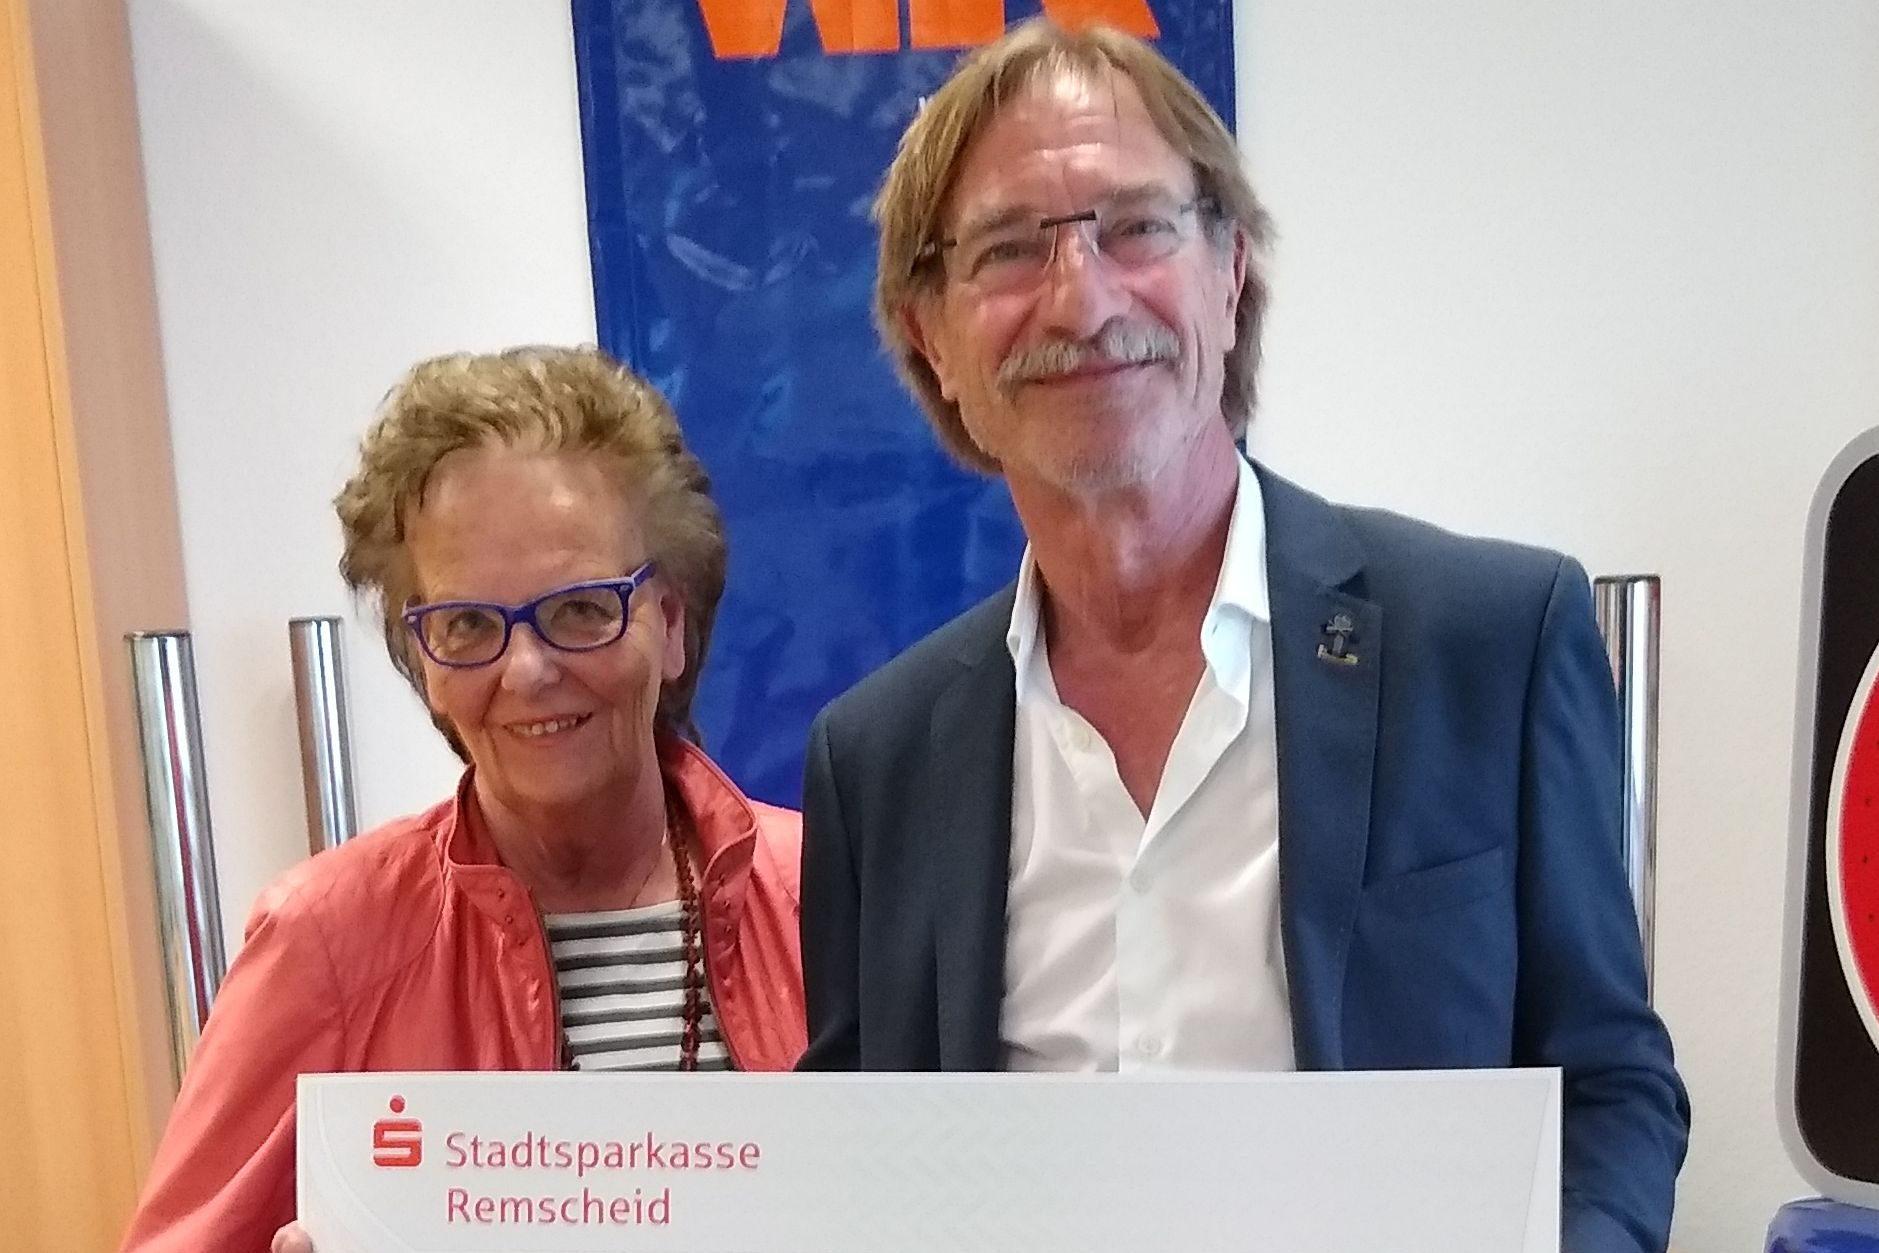 Spendenübergabe an PRAXIS OHNE GRENZEN e.V.